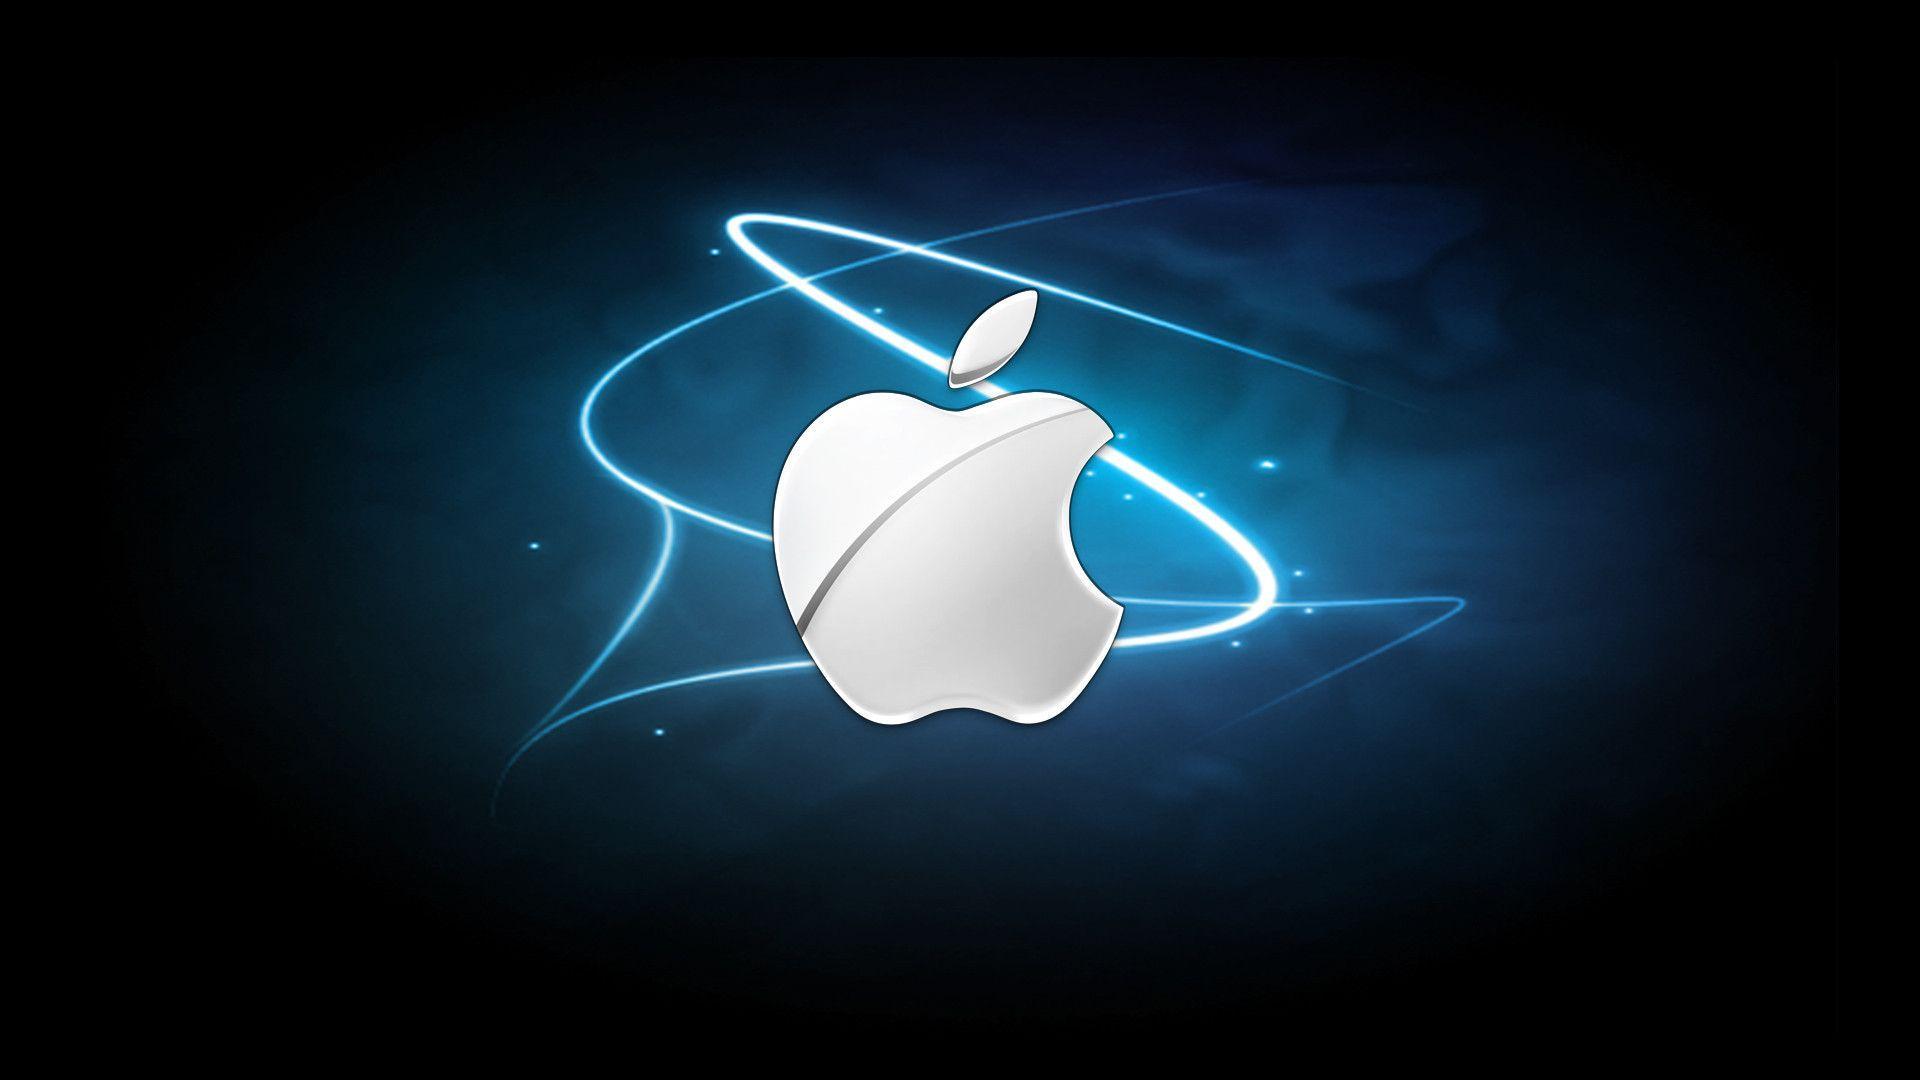 HDoboi.Kiev.ua - Apple logo wallpaper hd, скачать обои логотипы на телефон